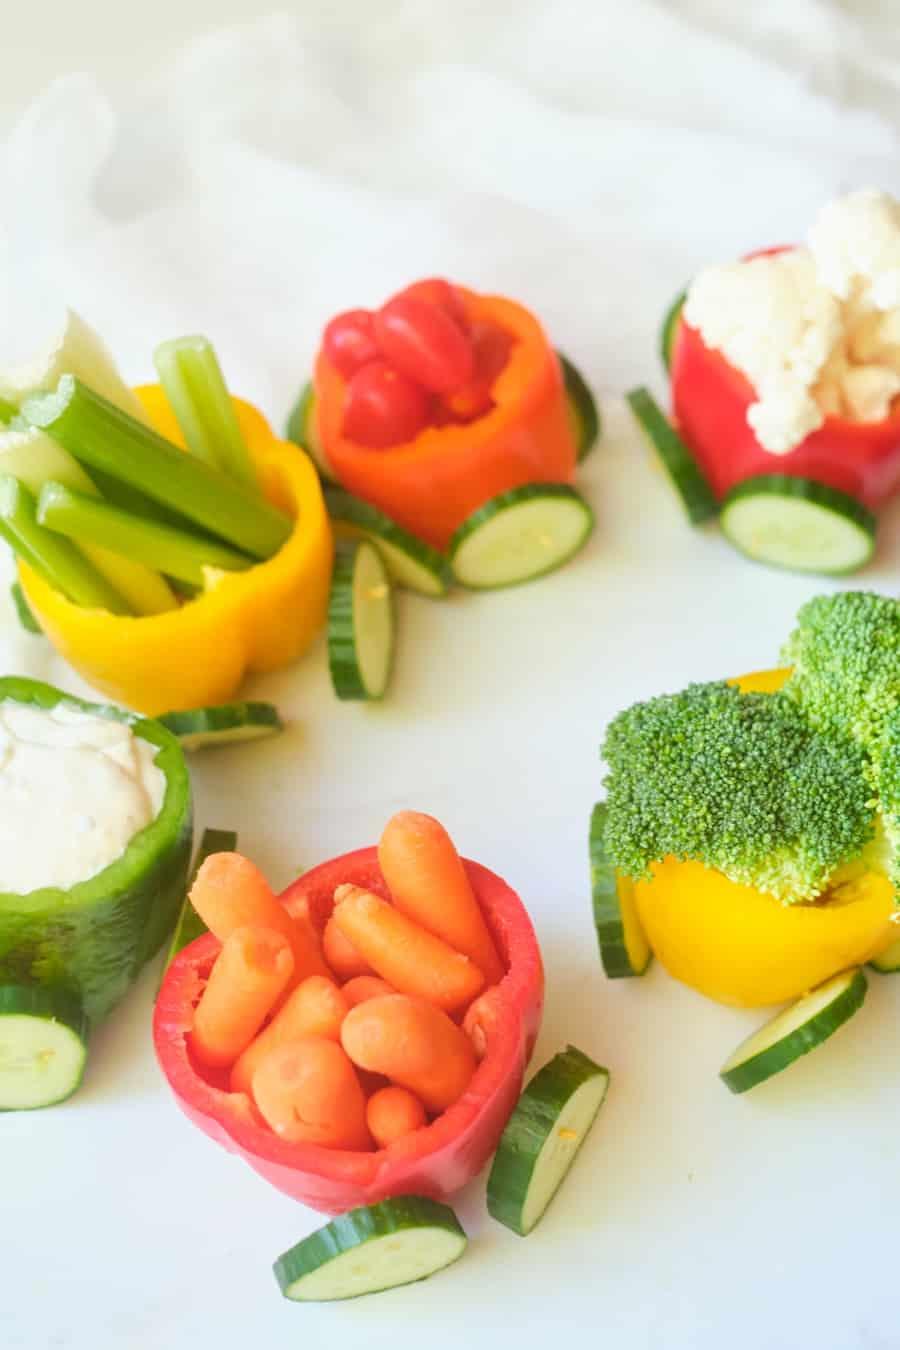 veggie train healthy snack for kids